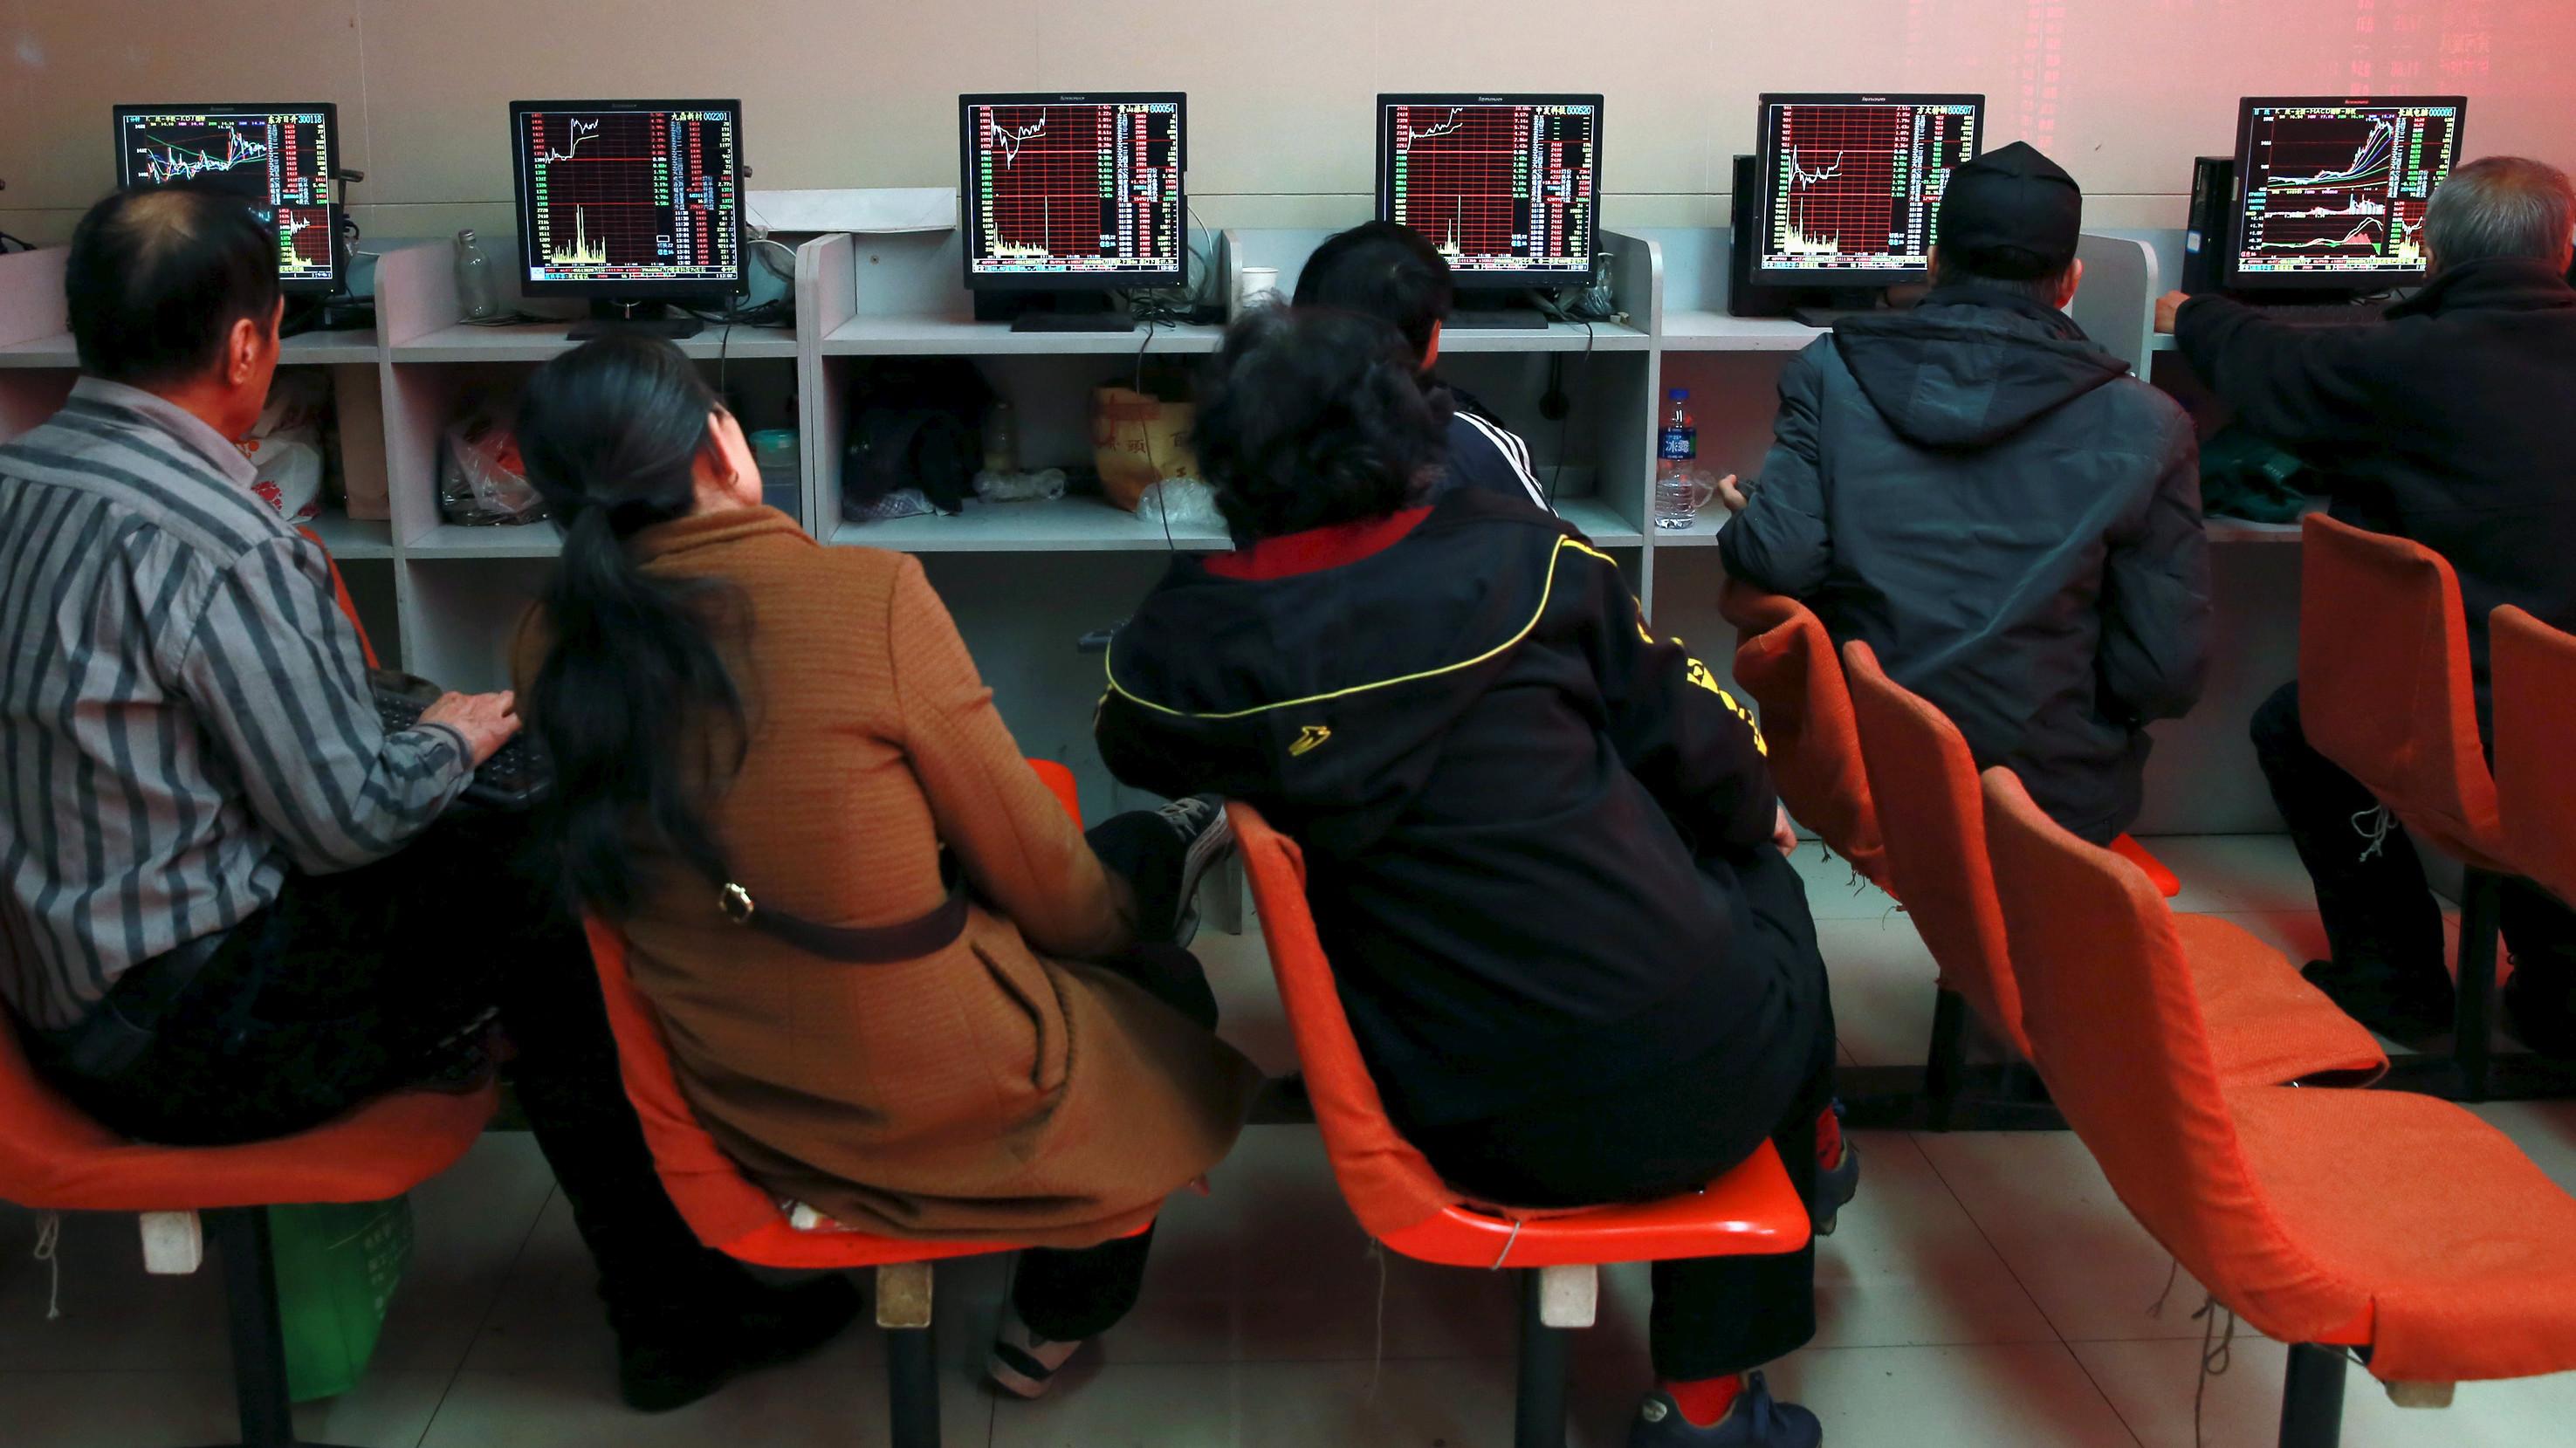 Investors look at computer screens showing stock information at a brokerage house in Shenyang, Liaoning province, April 13, 2015.